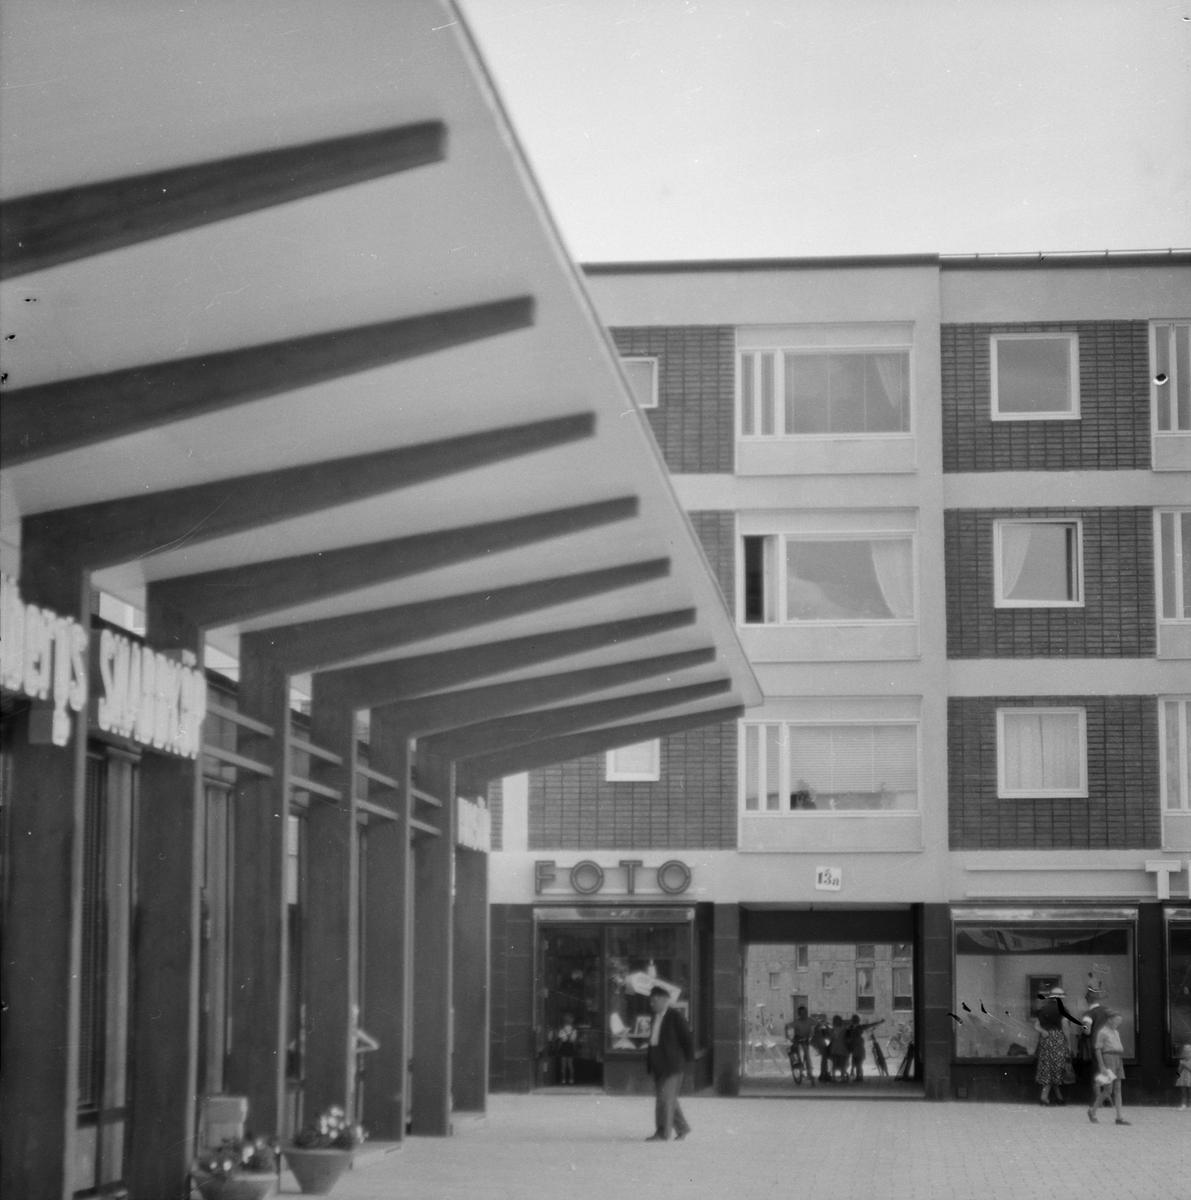 Brantingstorget, Sala backe i Uppsala